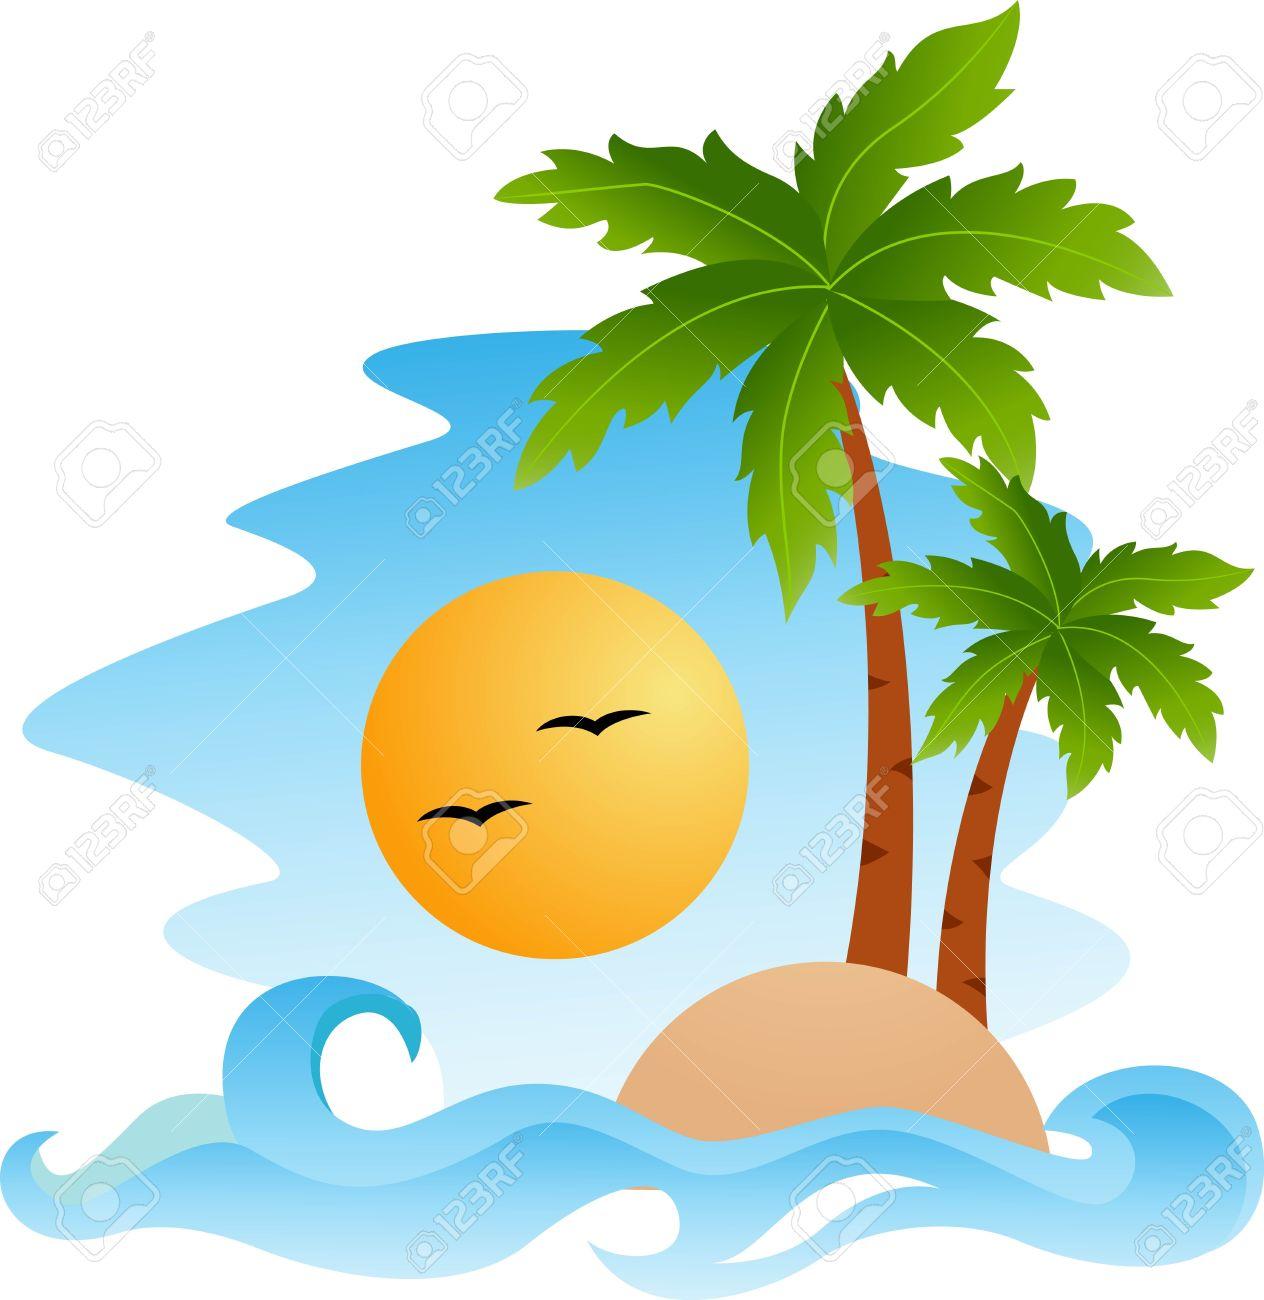 1264x1300 Tropical Cartoon Images